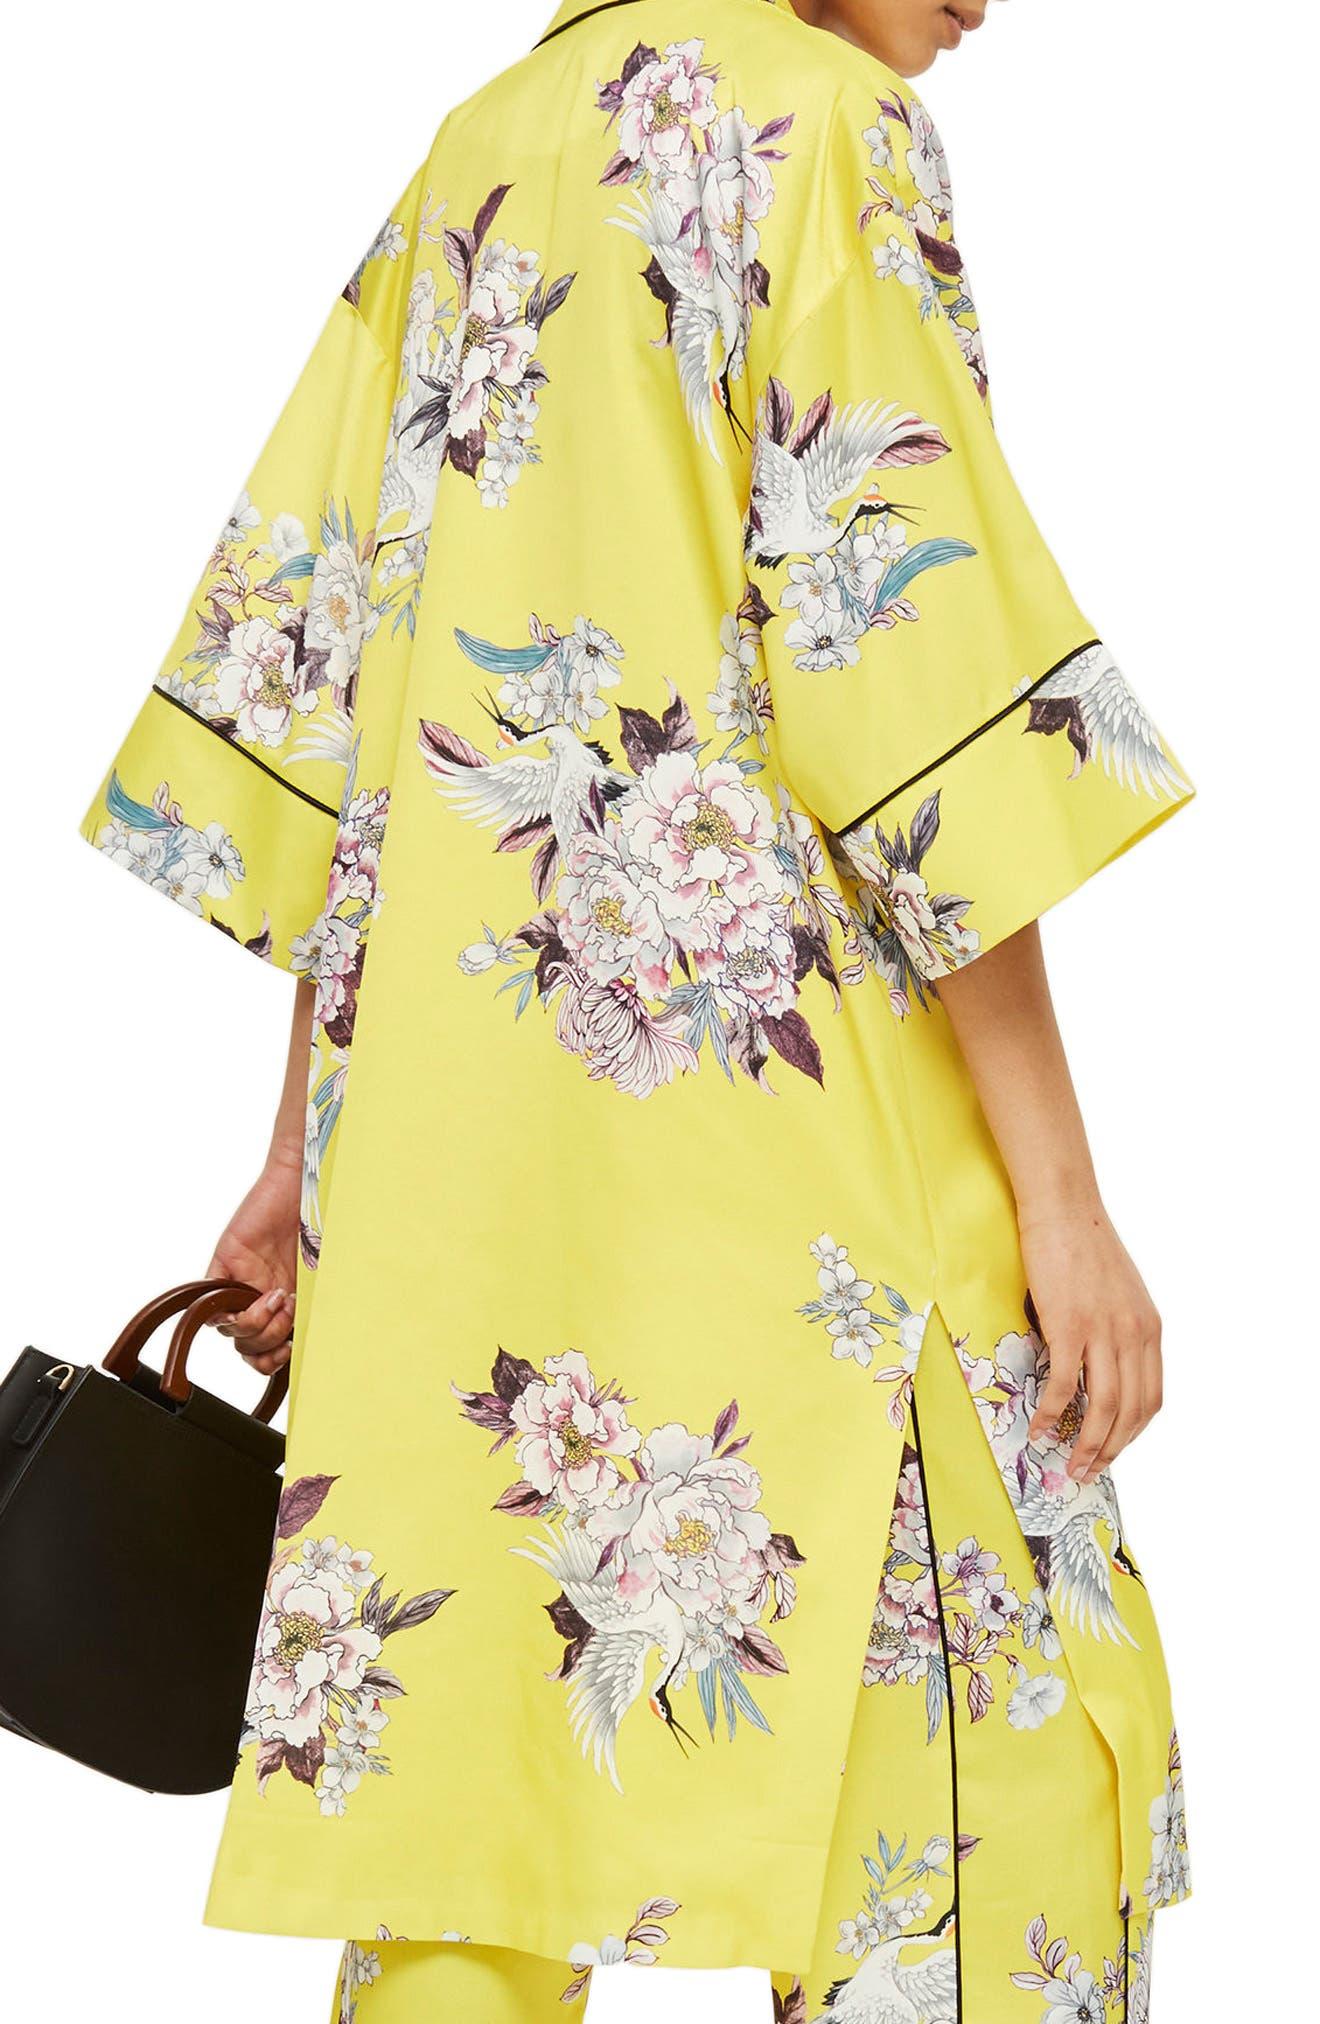 Heron Print Kimono,                             Alternate thumbnail 2, color,                             Yellow Multi